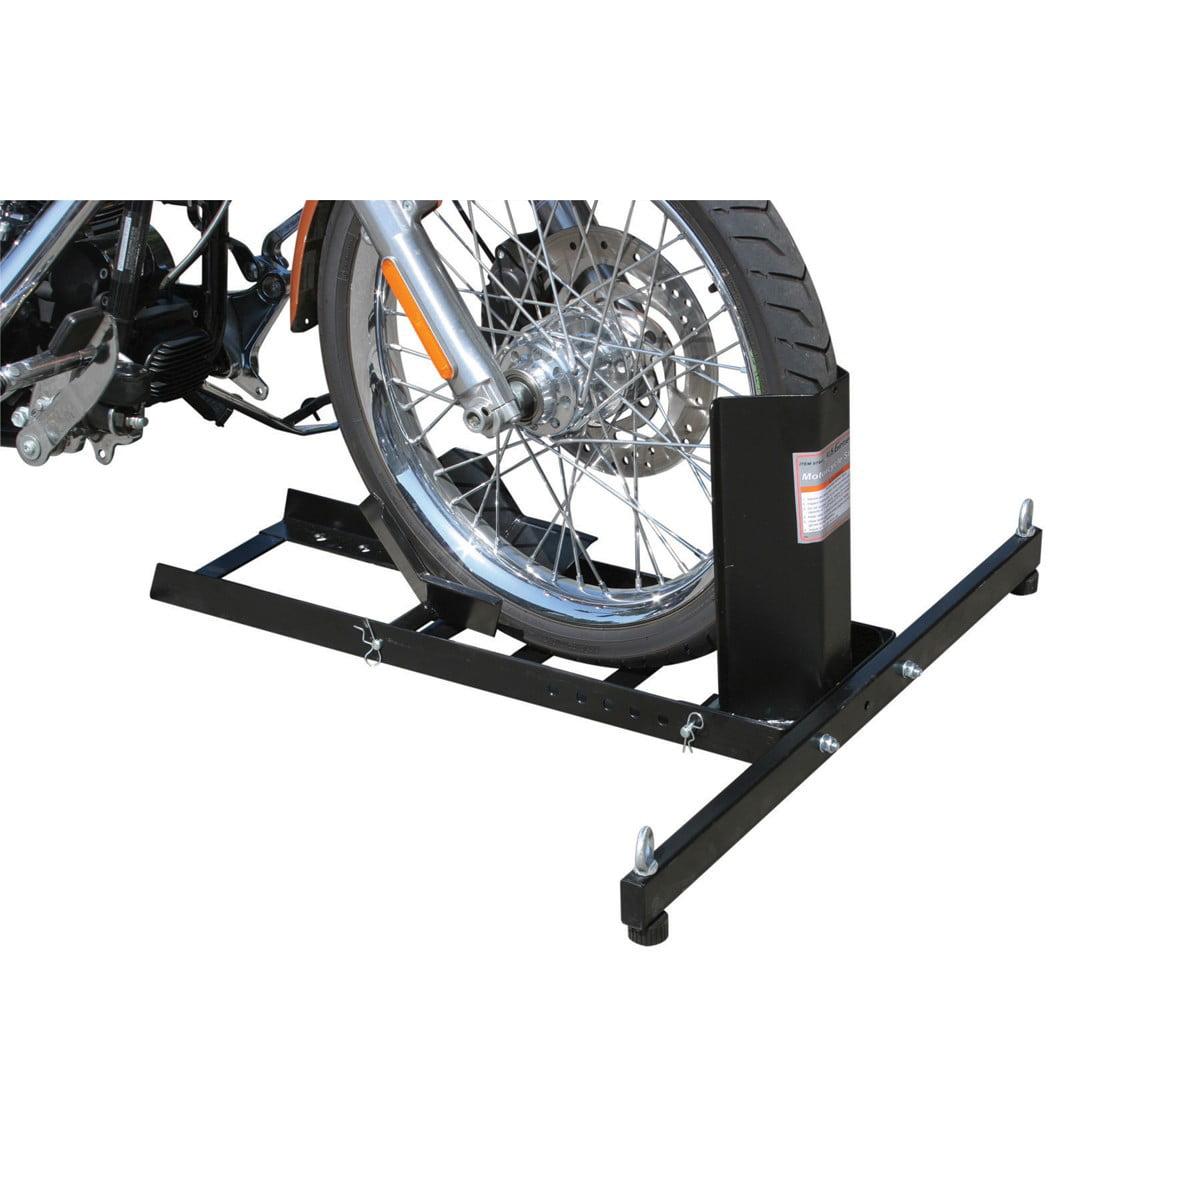 pittsburgh motorcycle motorcycle stand wheel chock 1800 lb capacity